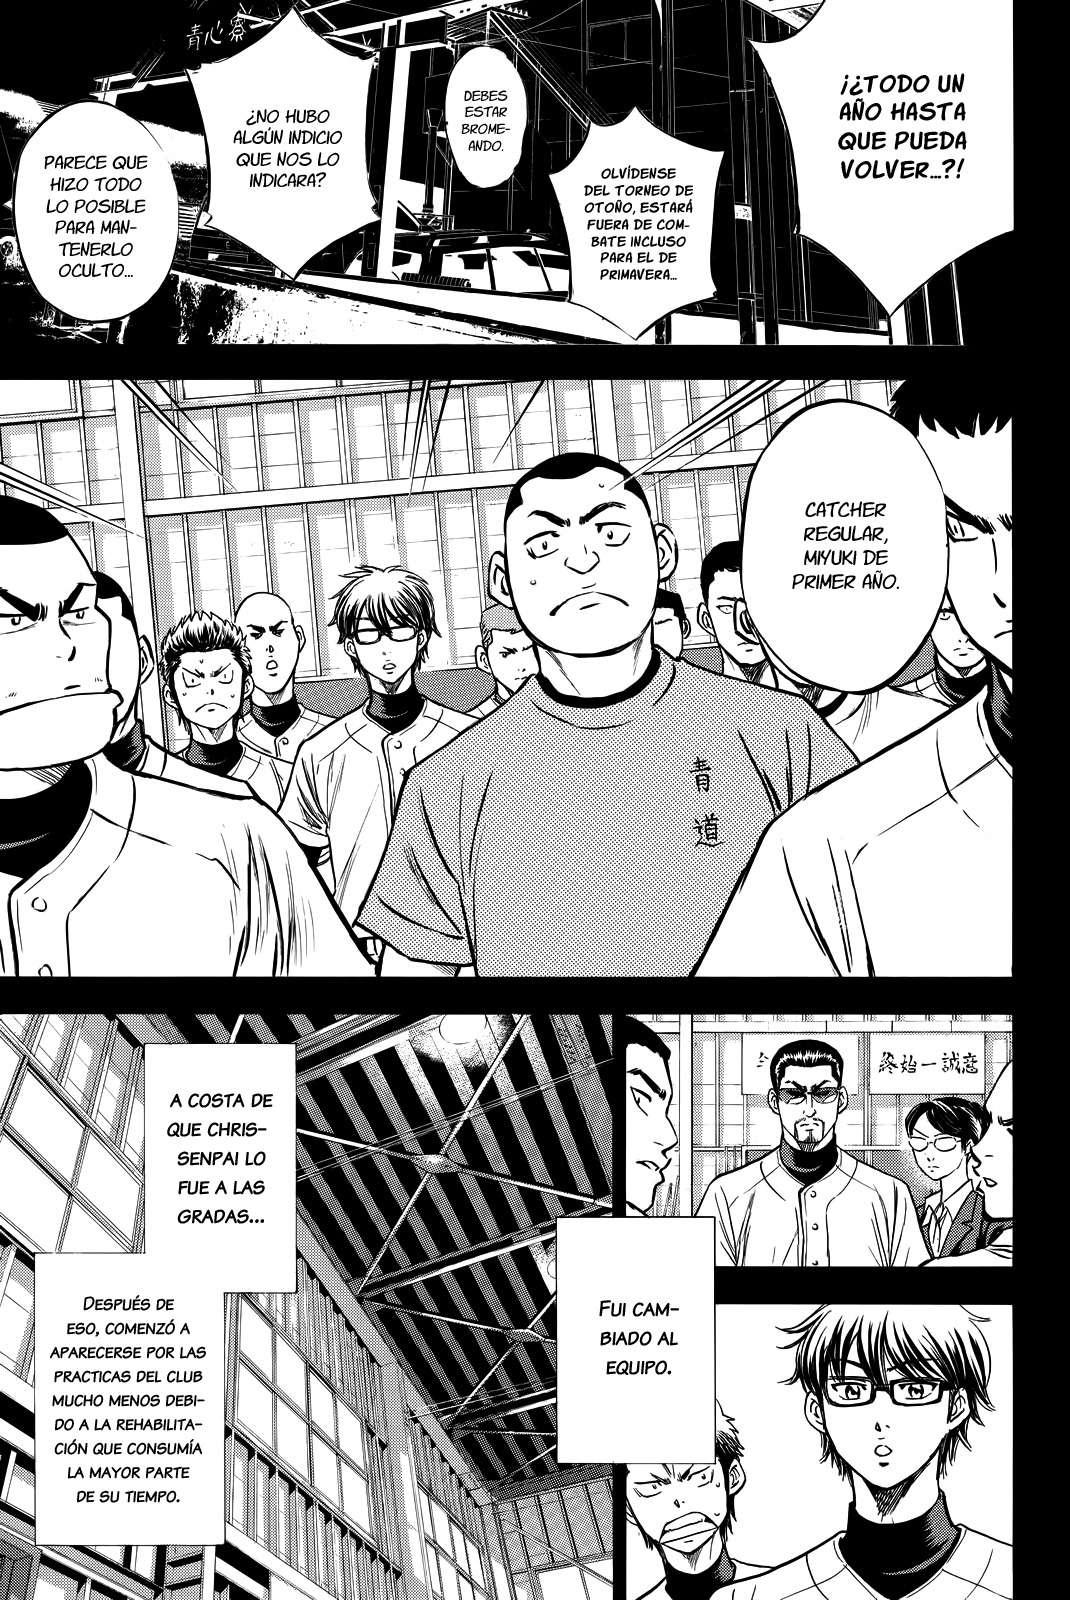 http://c5.ninemanga.com/es_manga/24/1752/430810/8e532663cf9bad68a3f0cc32cc971d11.jpg Page 19